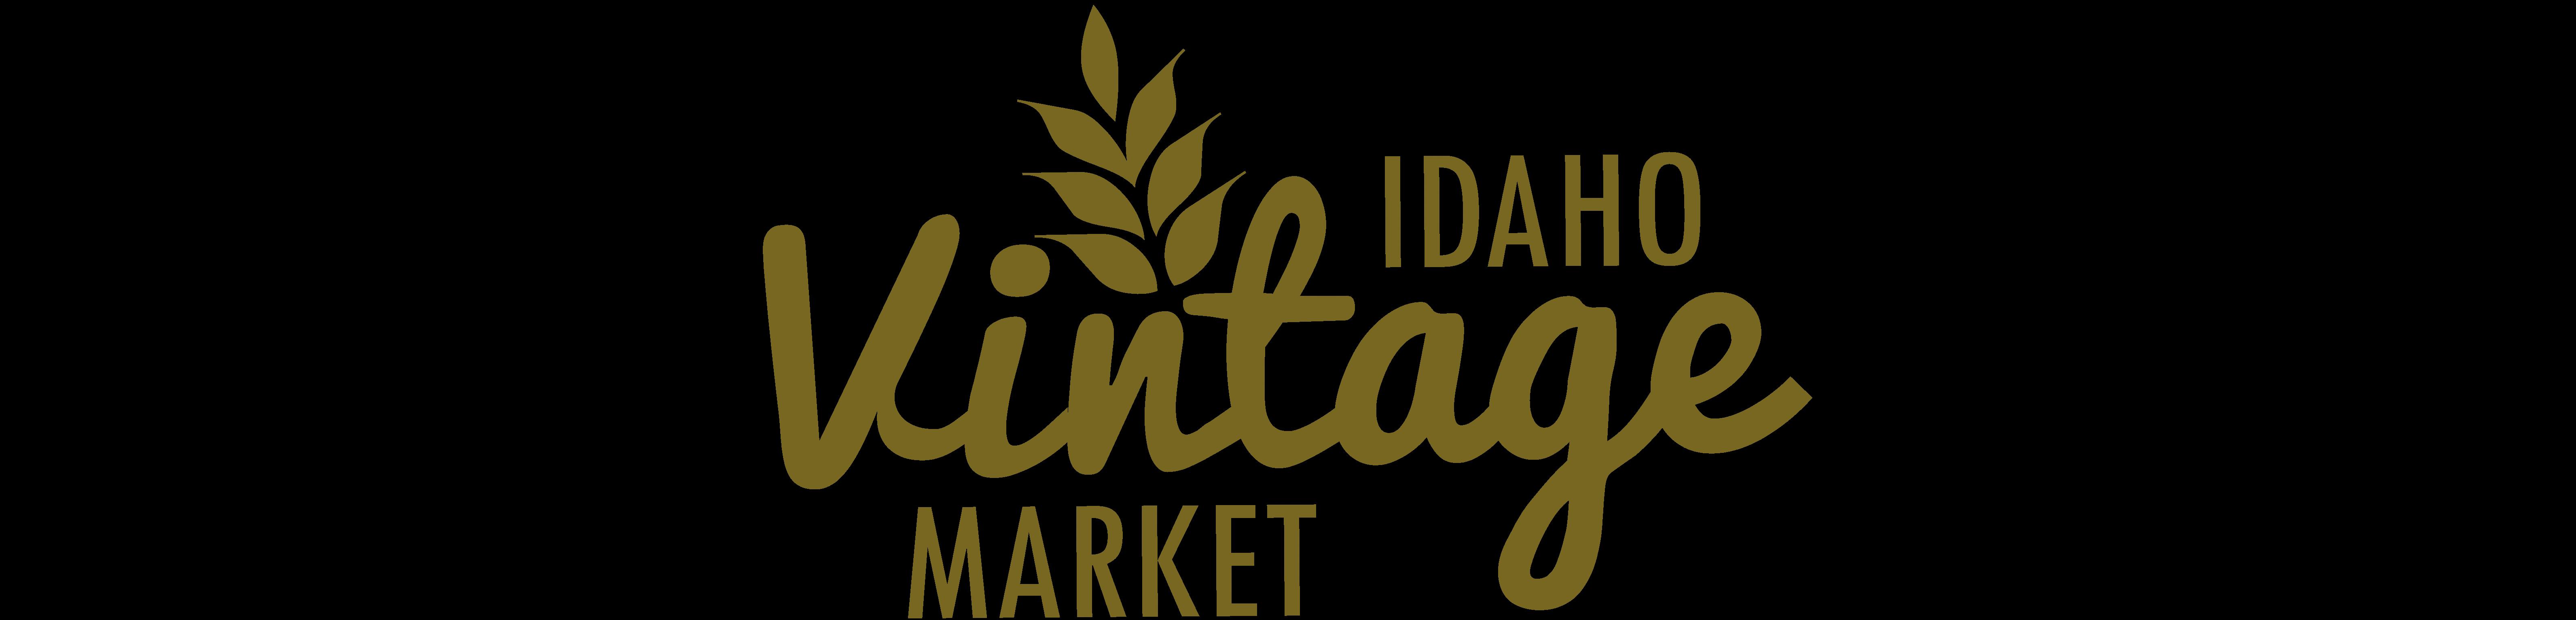 Idaho Vintage Market